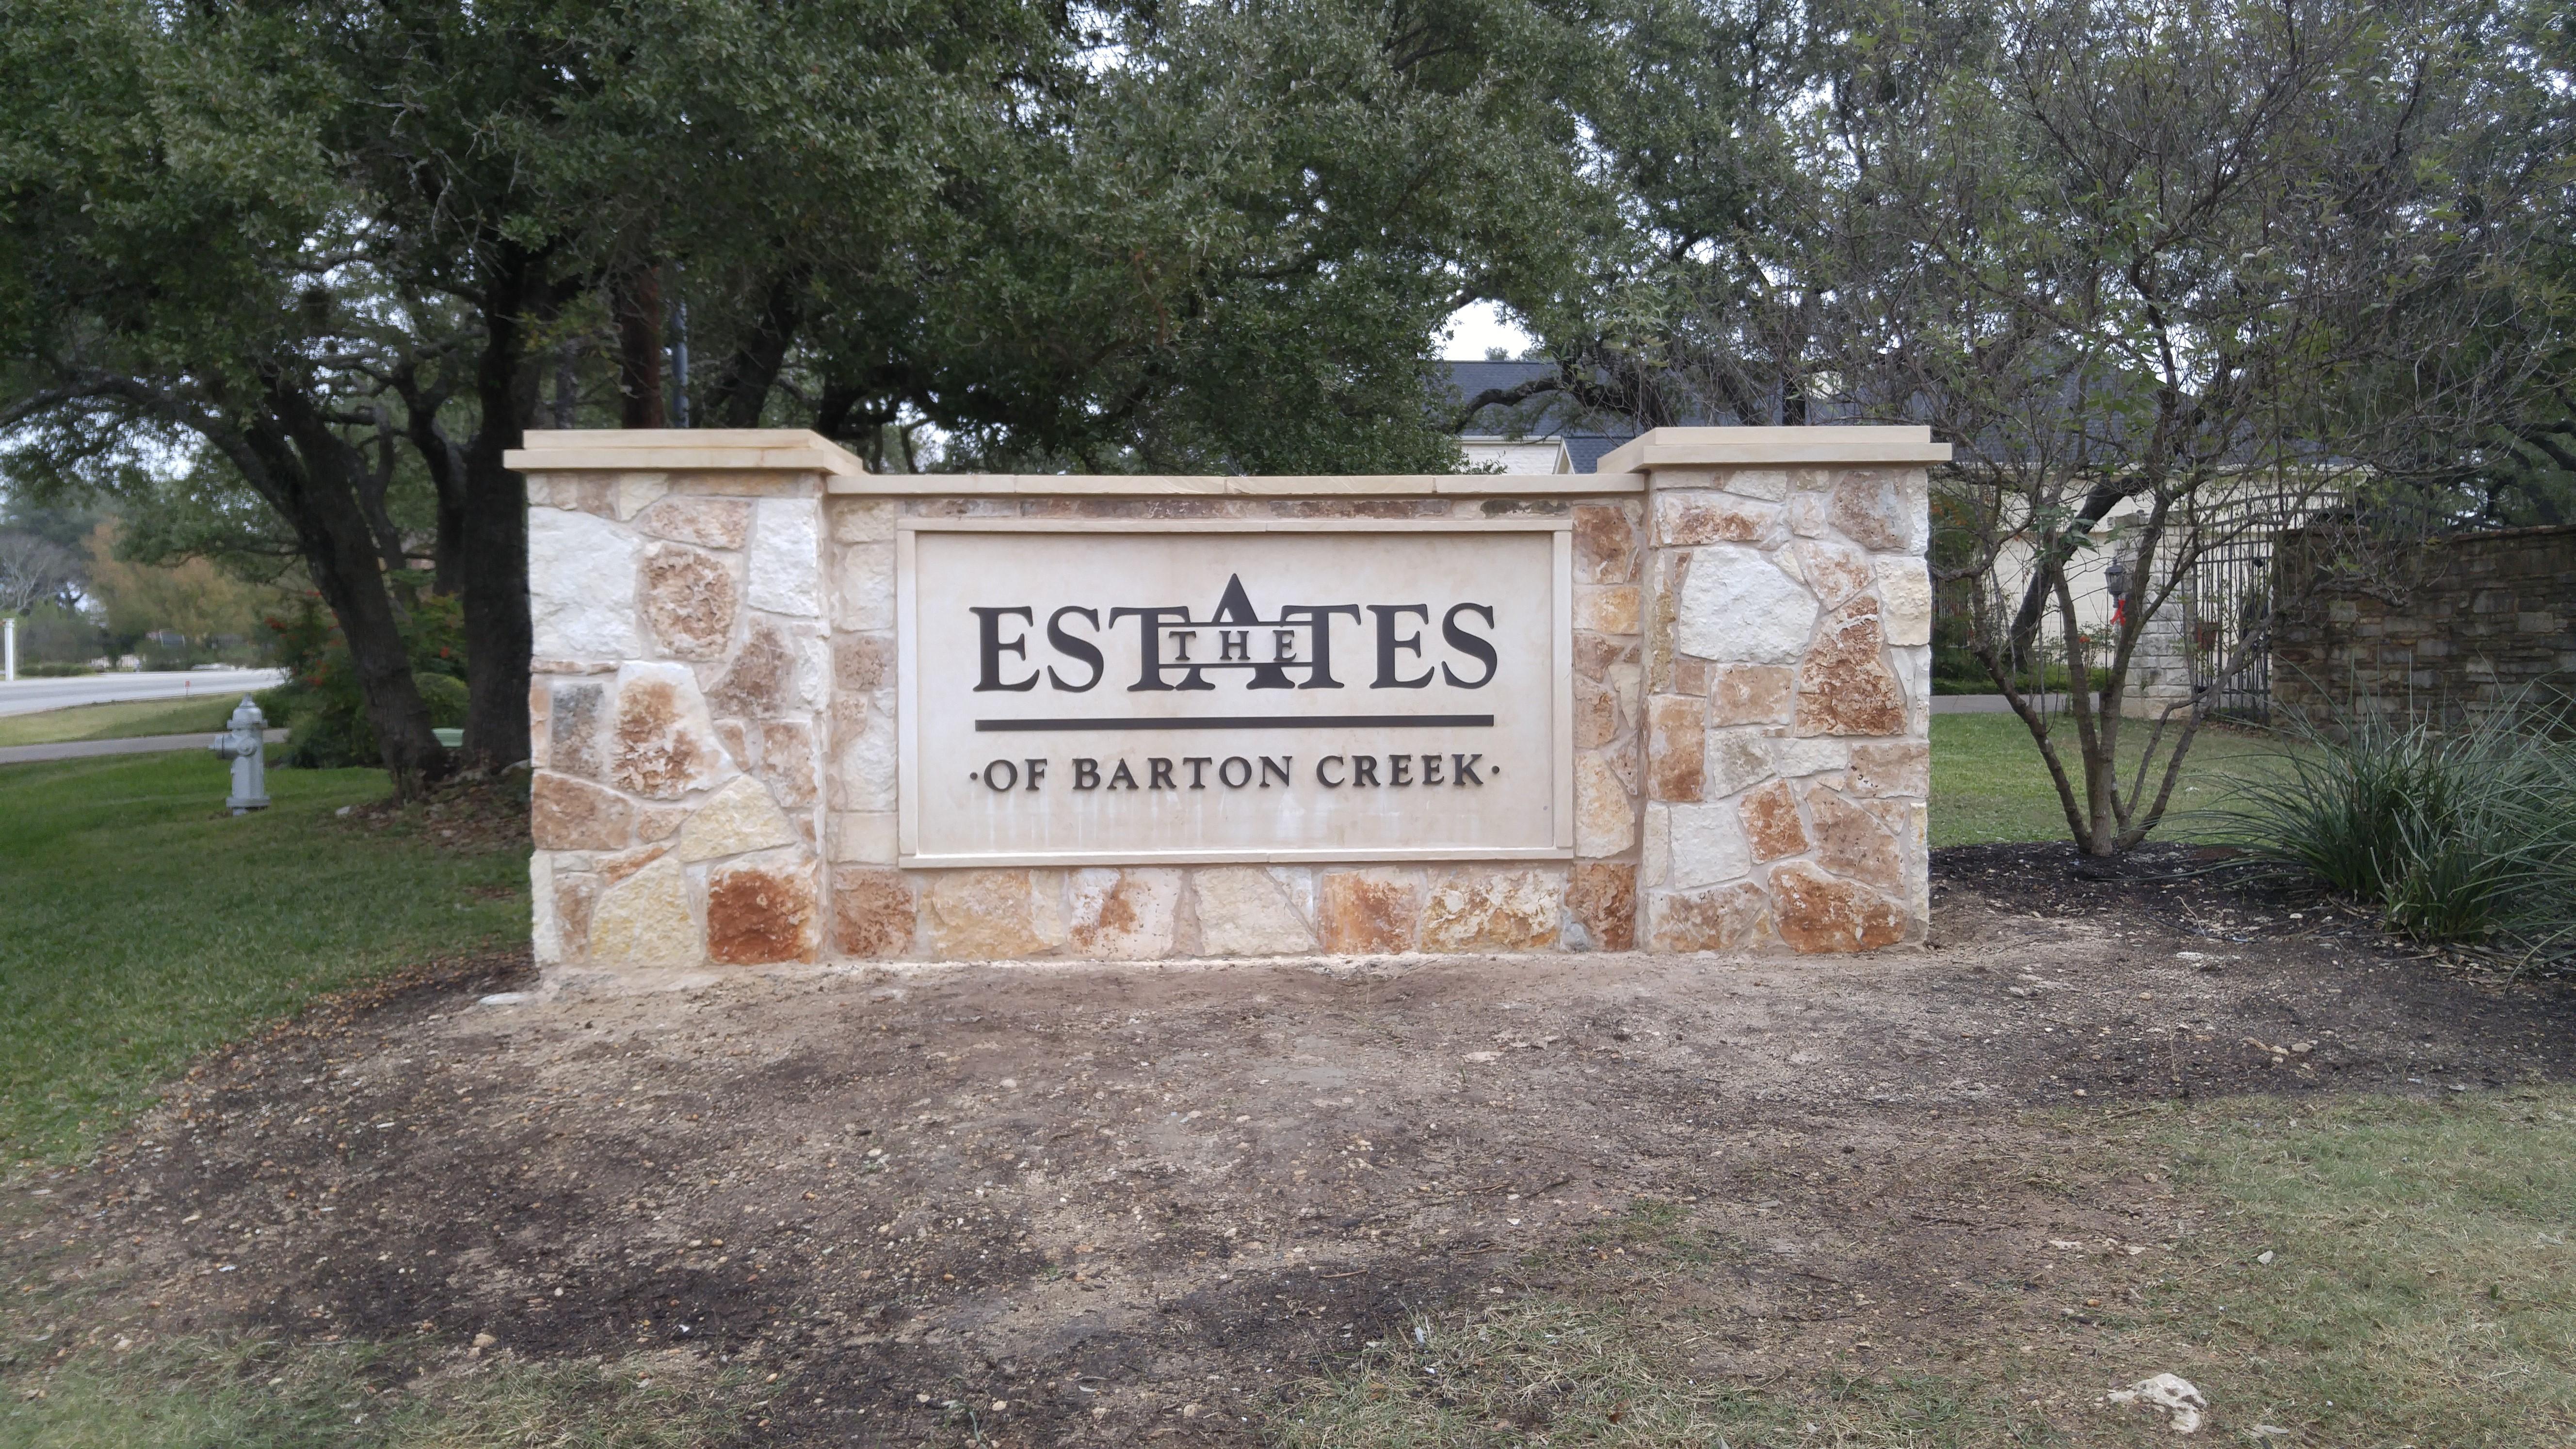 Estates of Barton Creek Monument